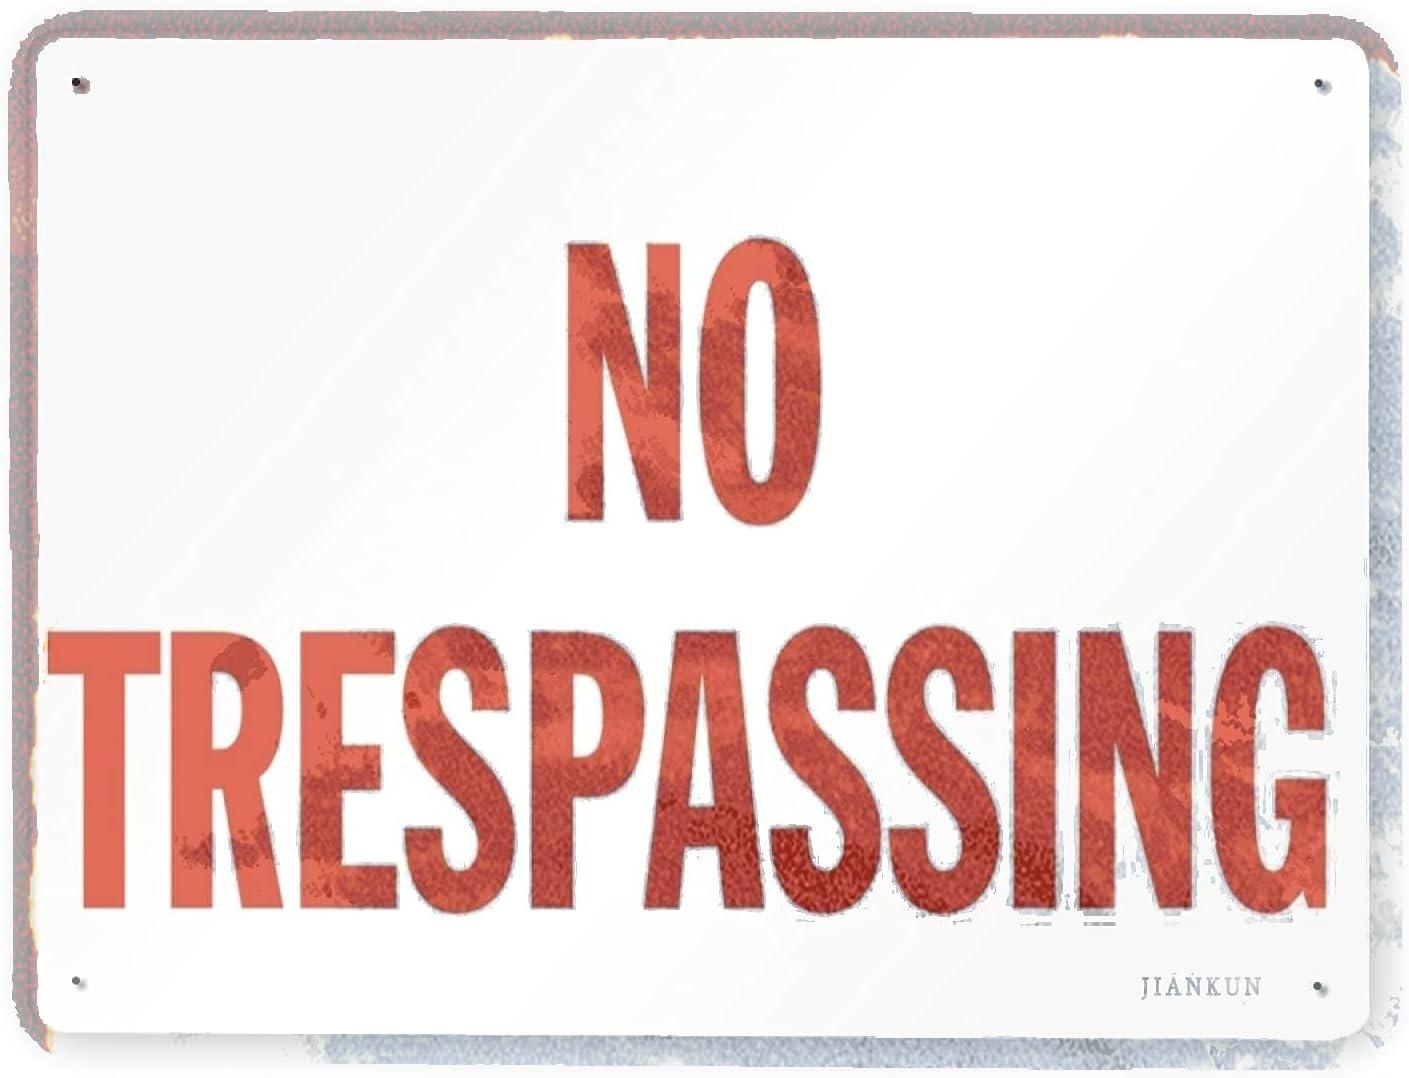 Max 49% OFF J.DXHYA Man Cave Decor Max 85% OFF 2 Pieces Trespassing no Hori Warning Sign